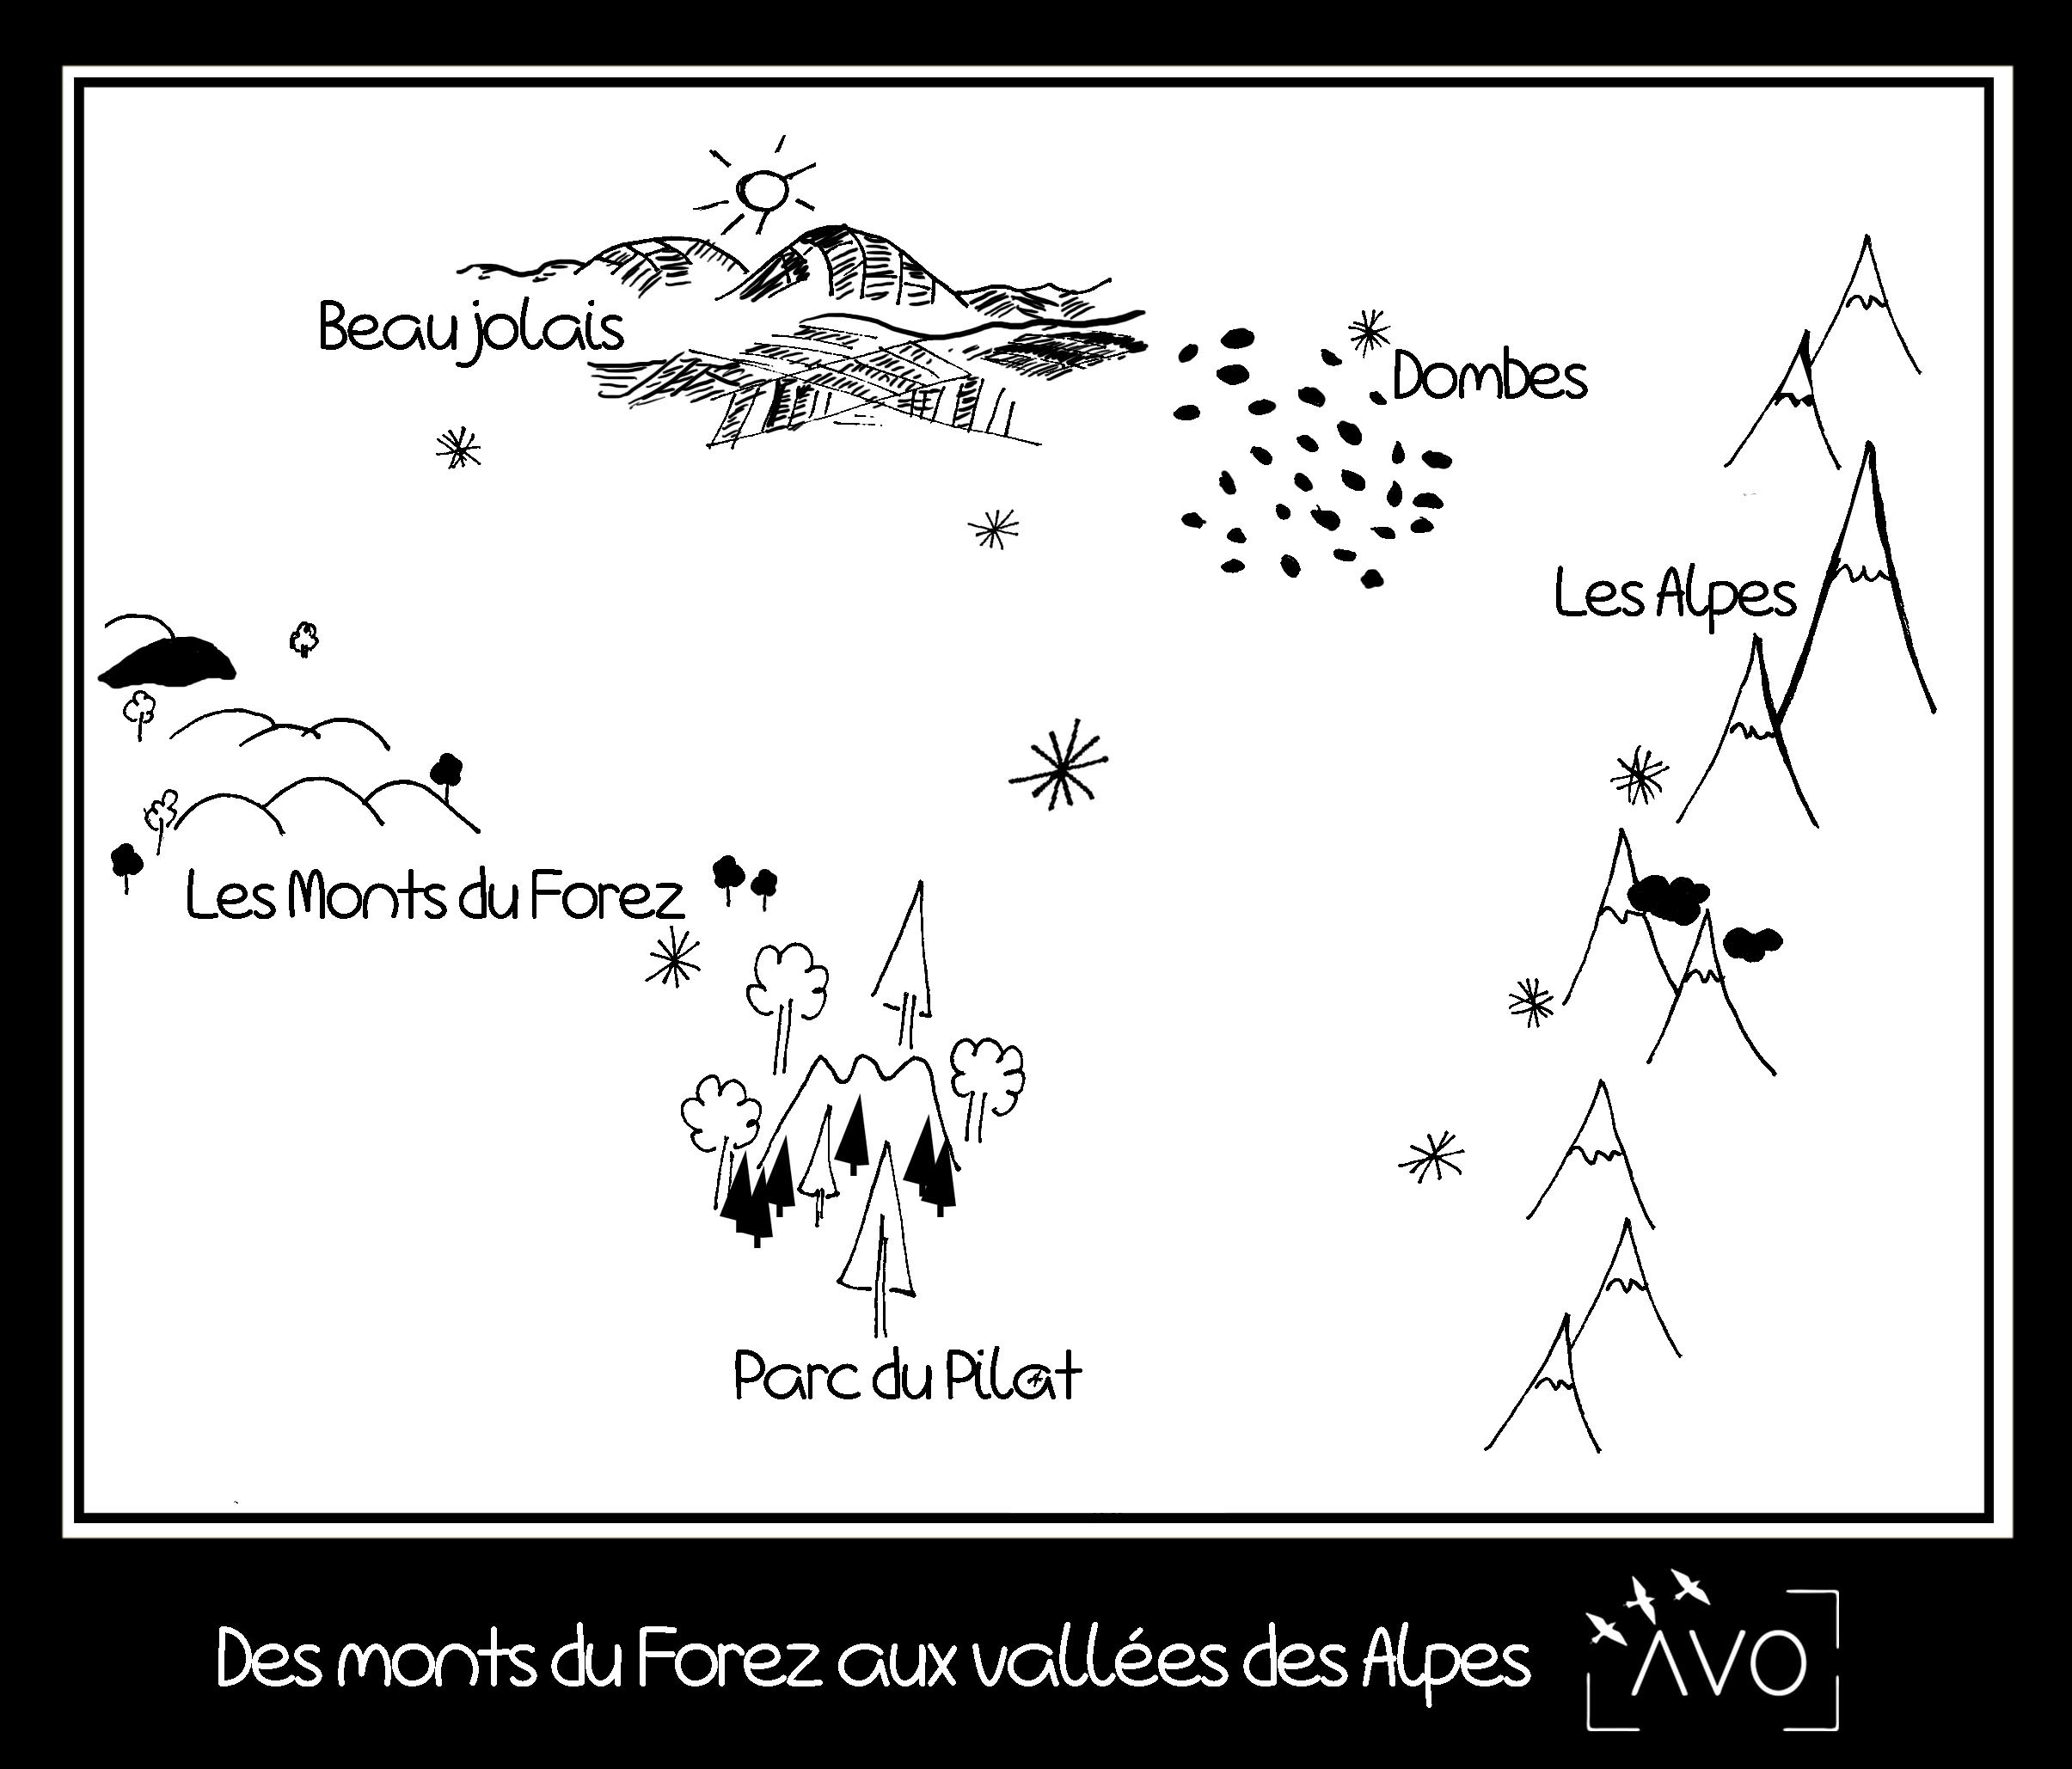 plan secteur avoldoiseau rhone alpes